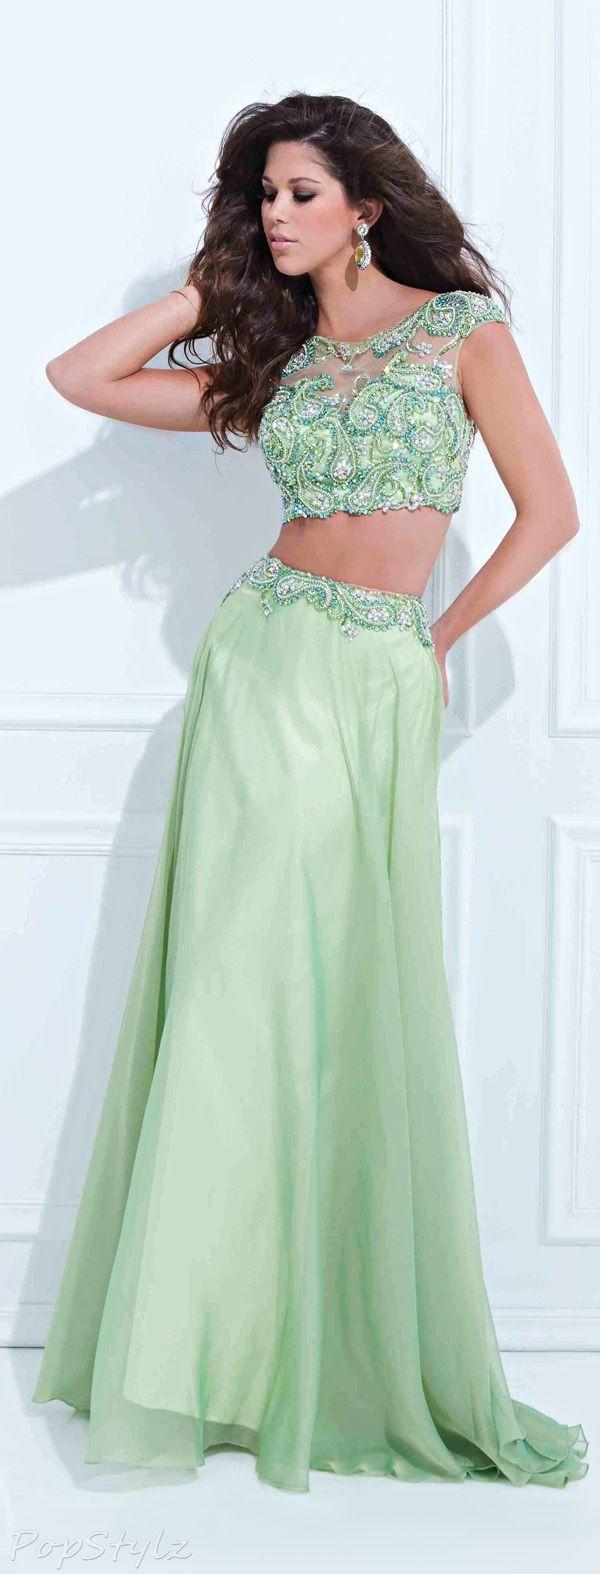 Tony Bowls Gorgeous Gown